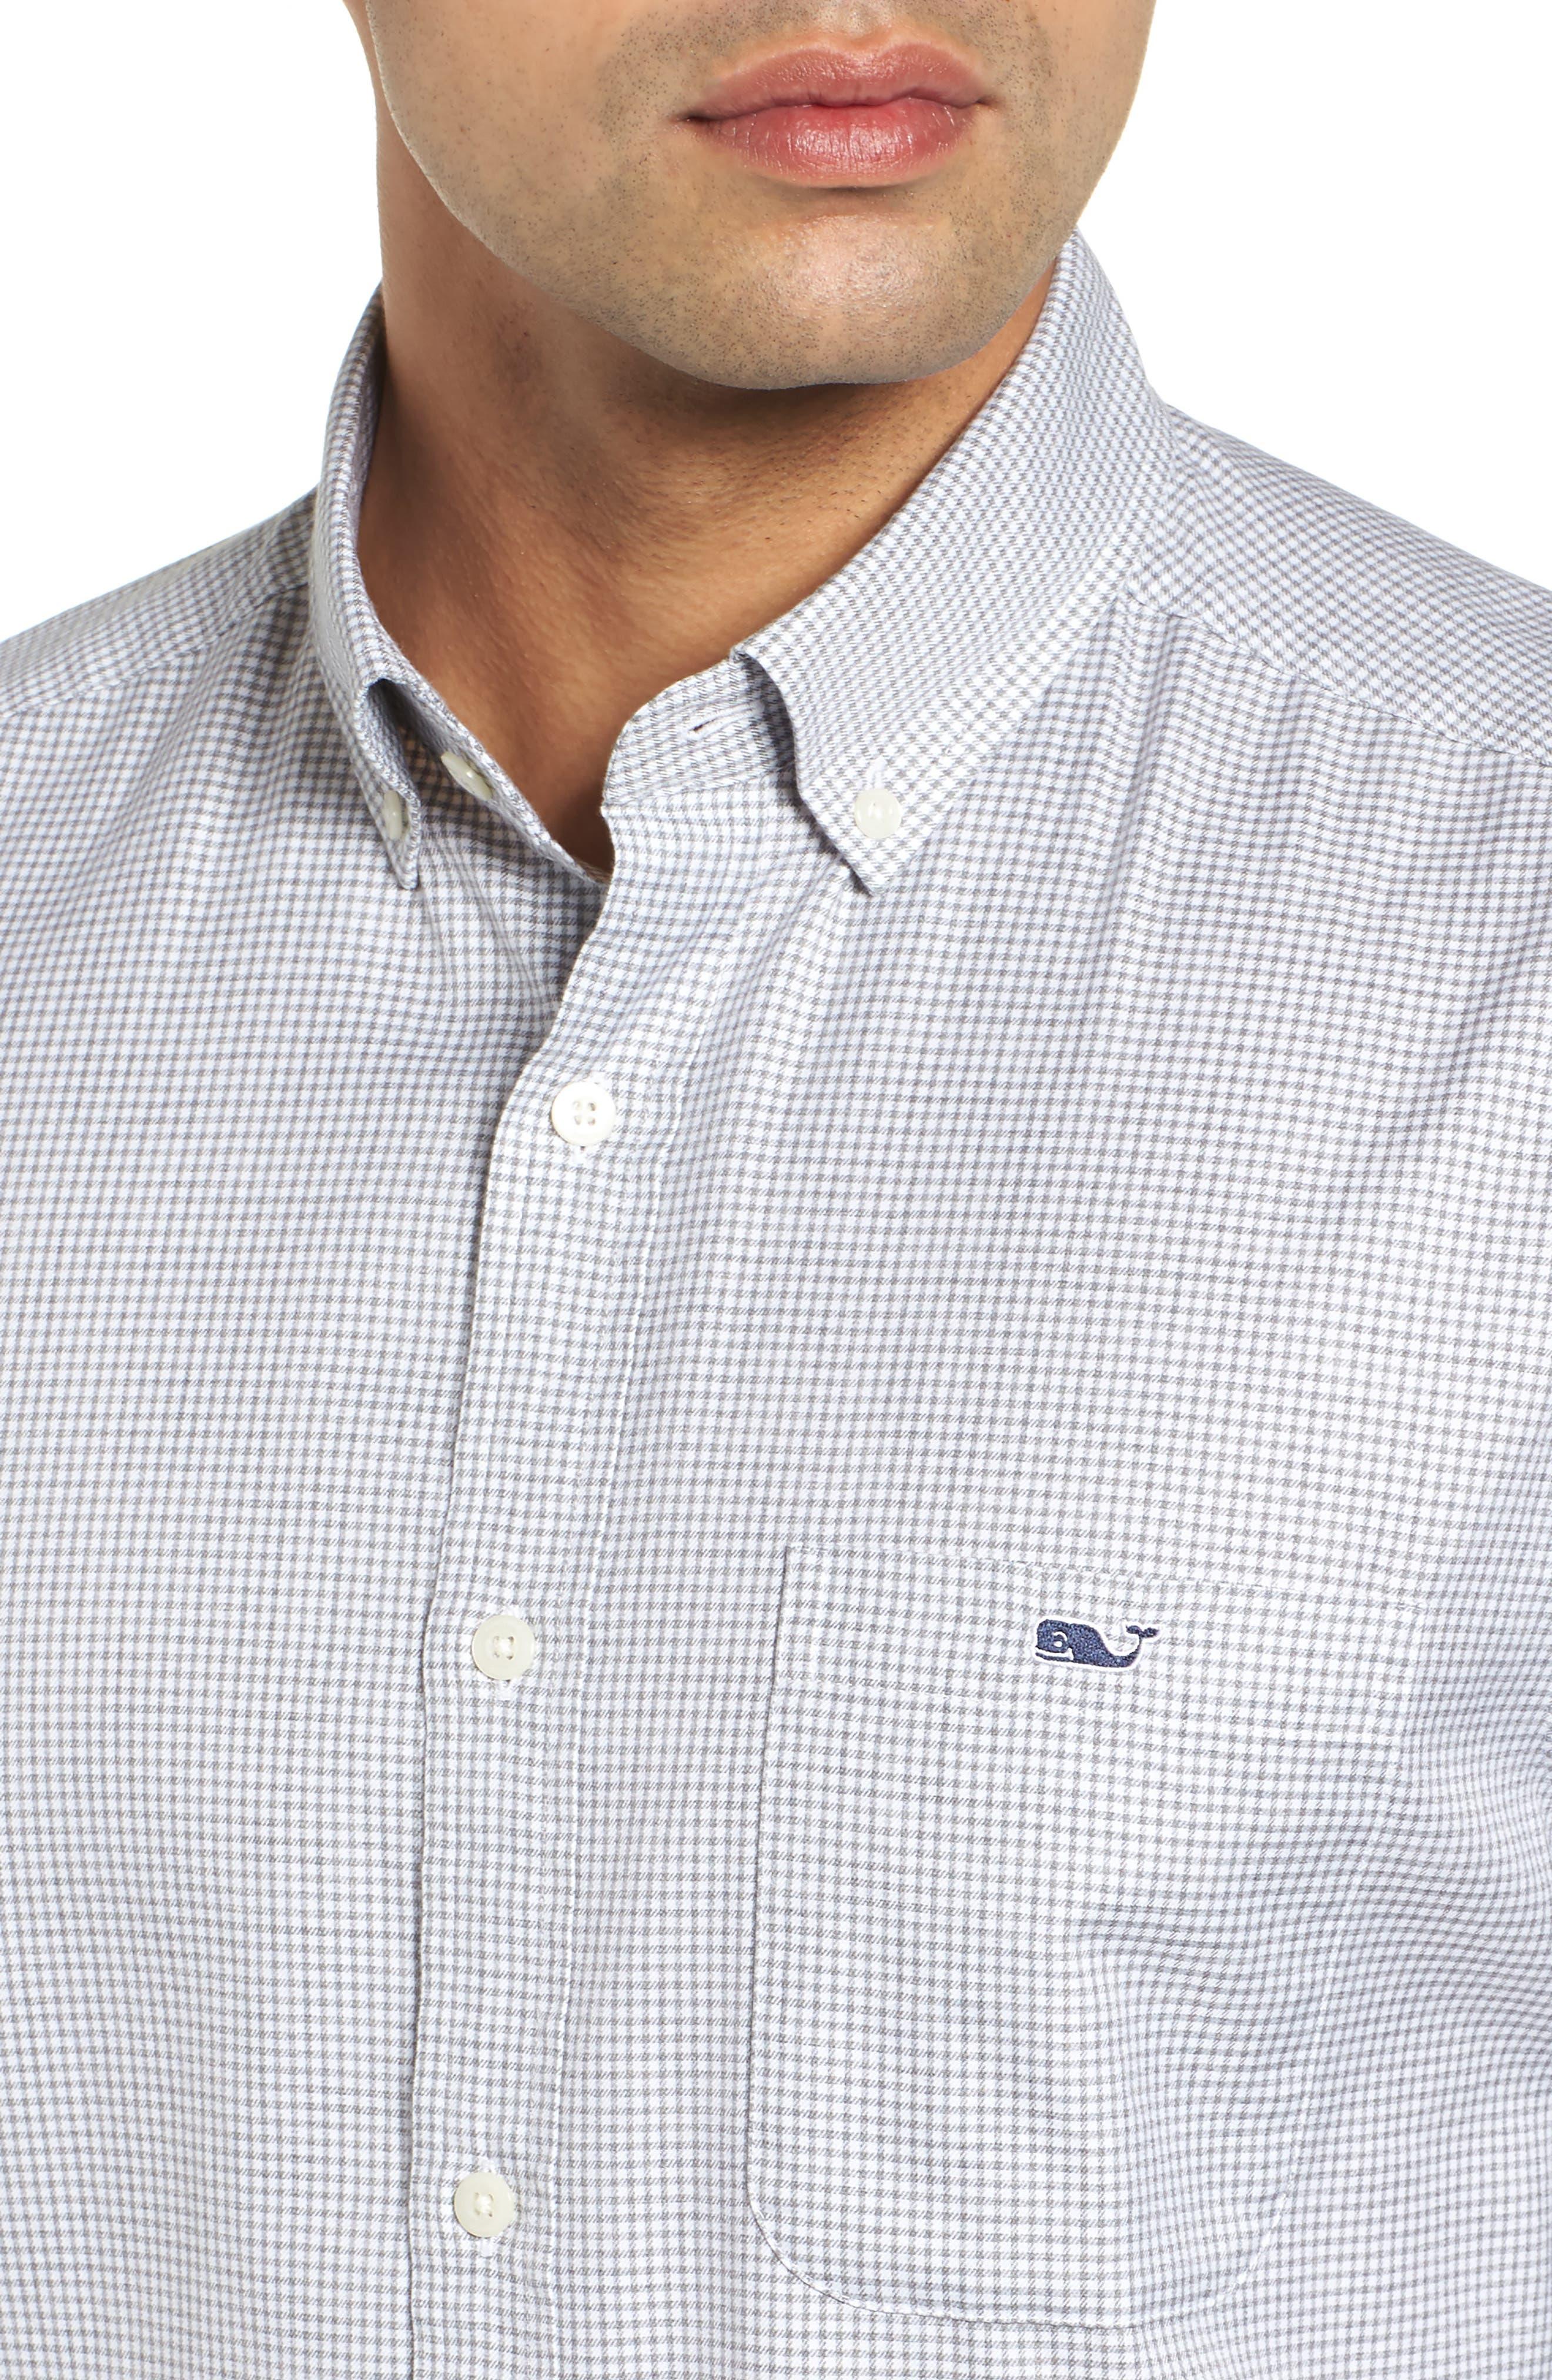 Kettle Cove Regular Fit Gingham Sport Shirt,                             Alternate thumbnail 2, color,                             BARRACUDA